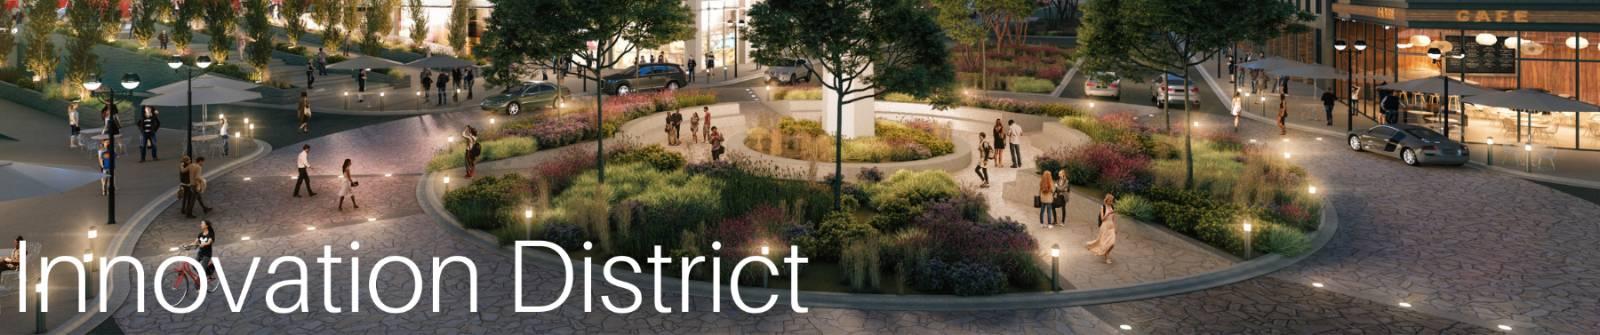 innovation district